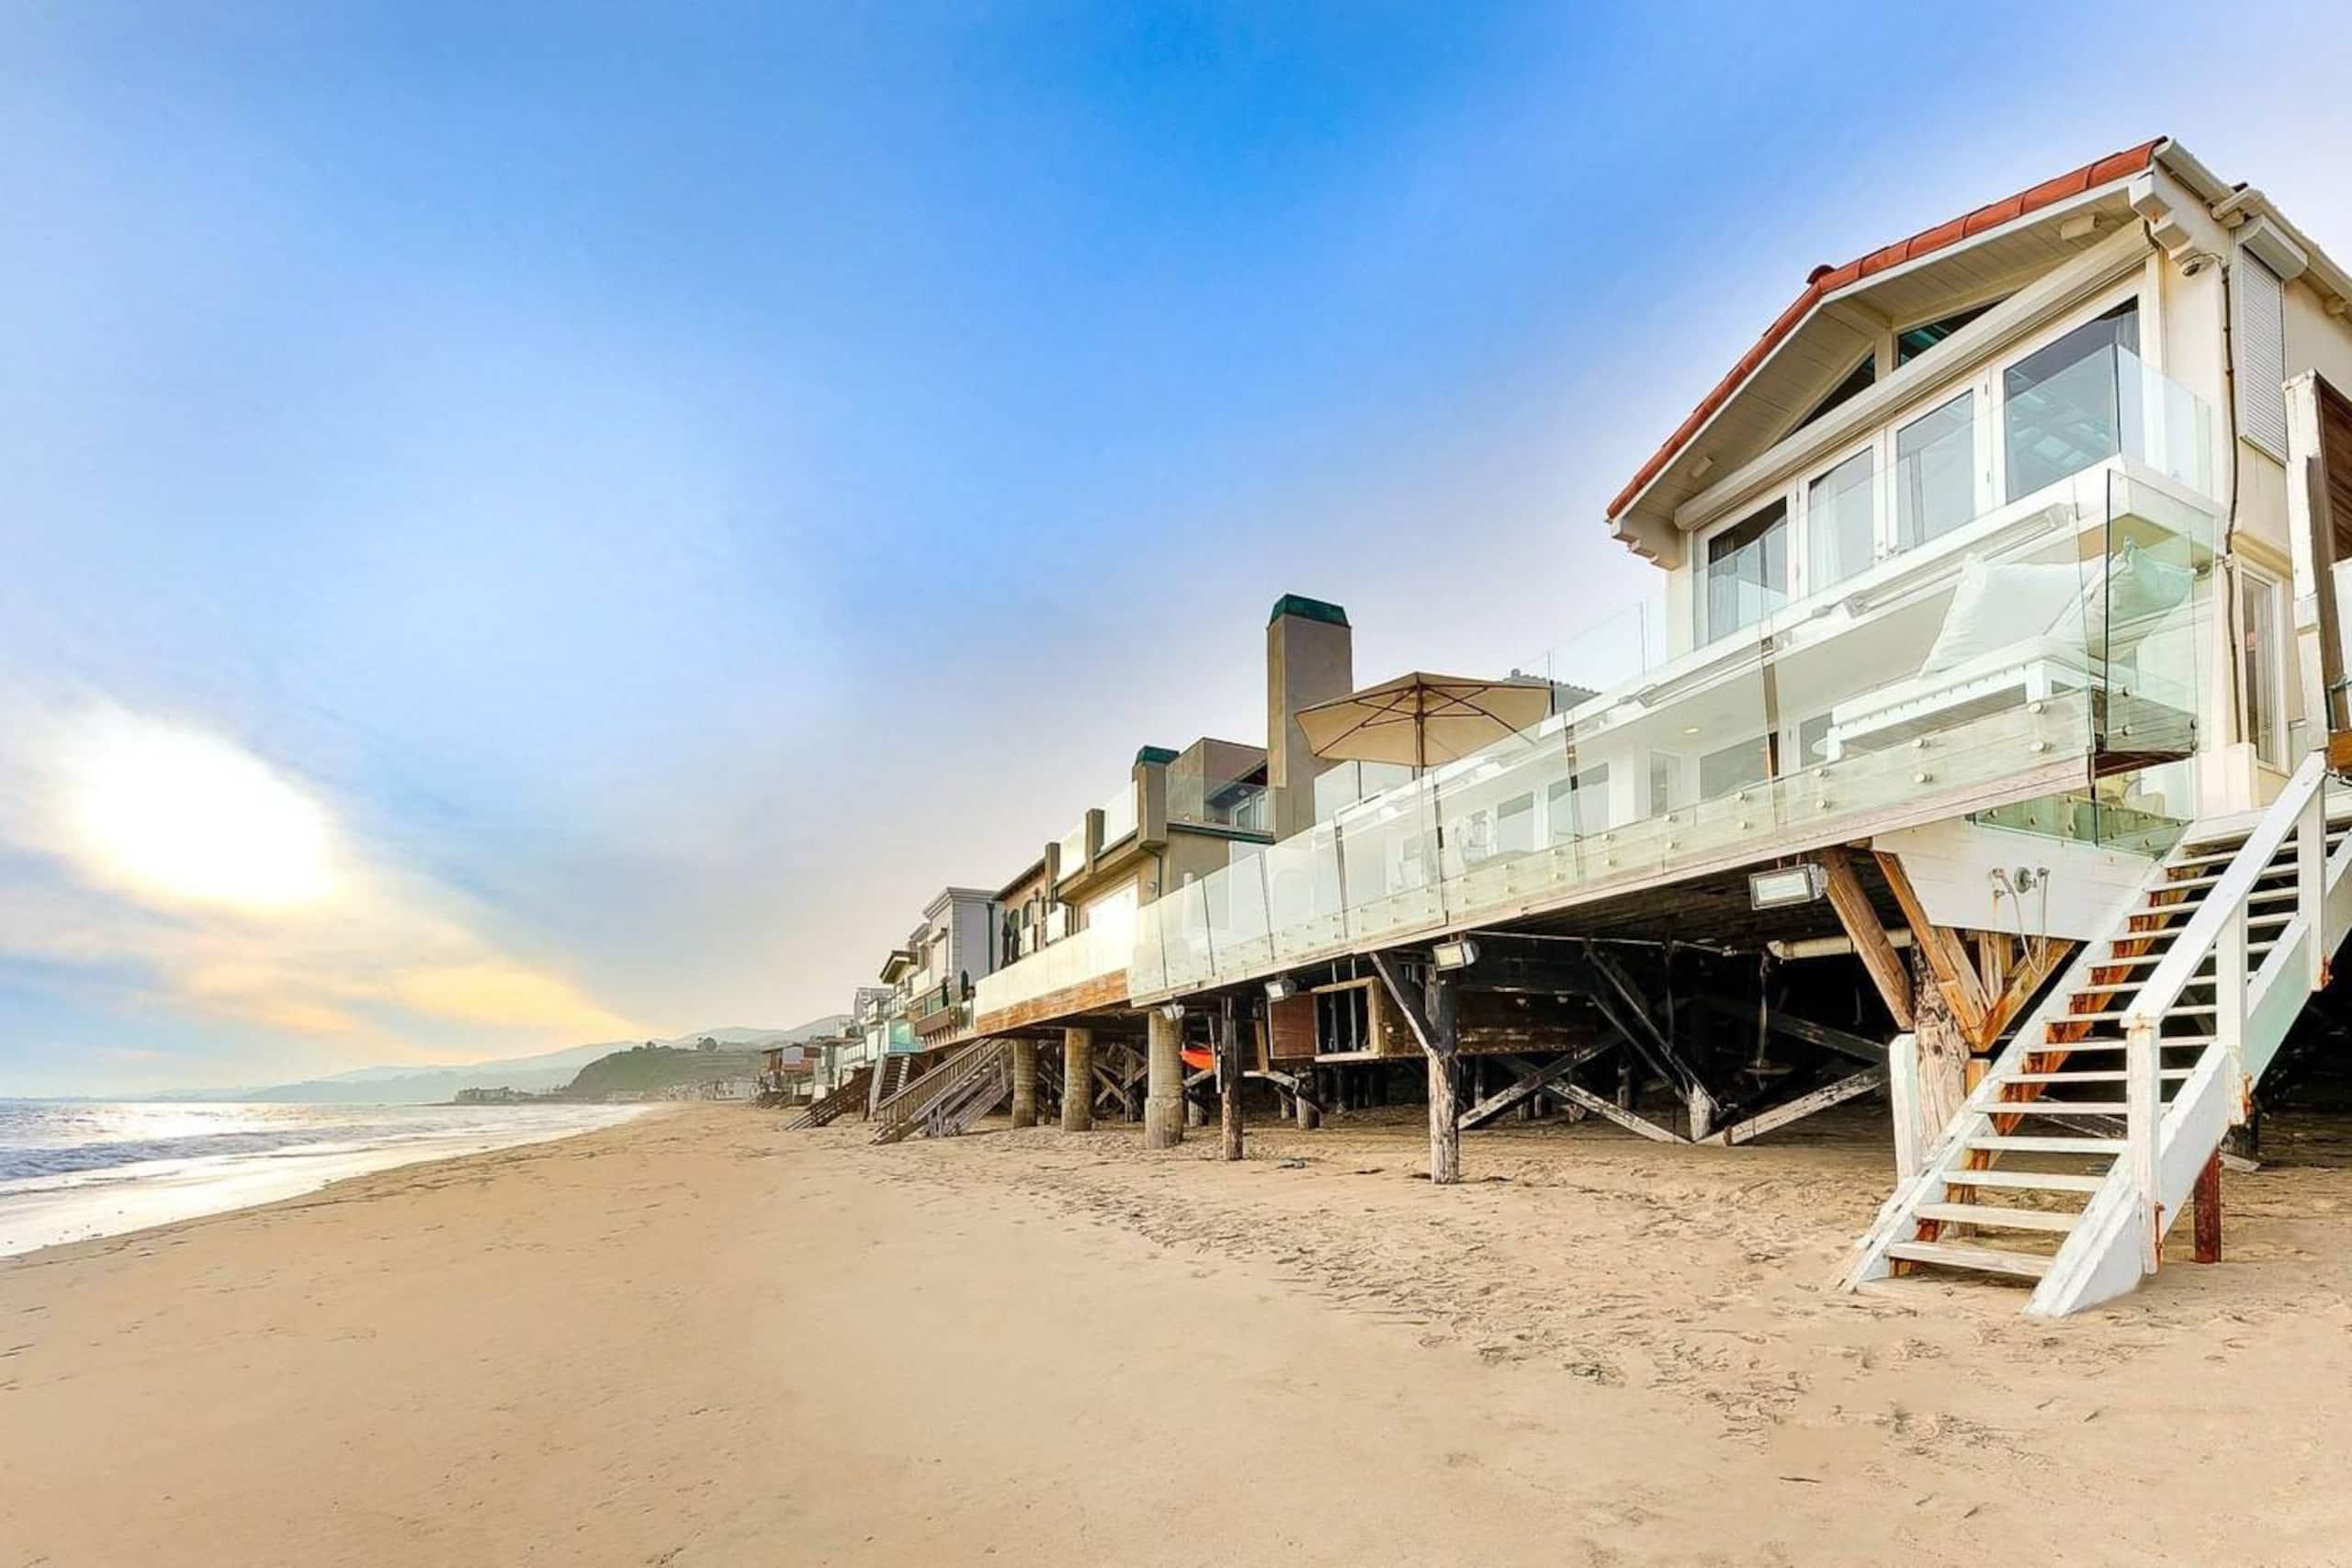 Apartment Villa Shawaiz - Beachfront Villa with 5 beds  photo 20334293